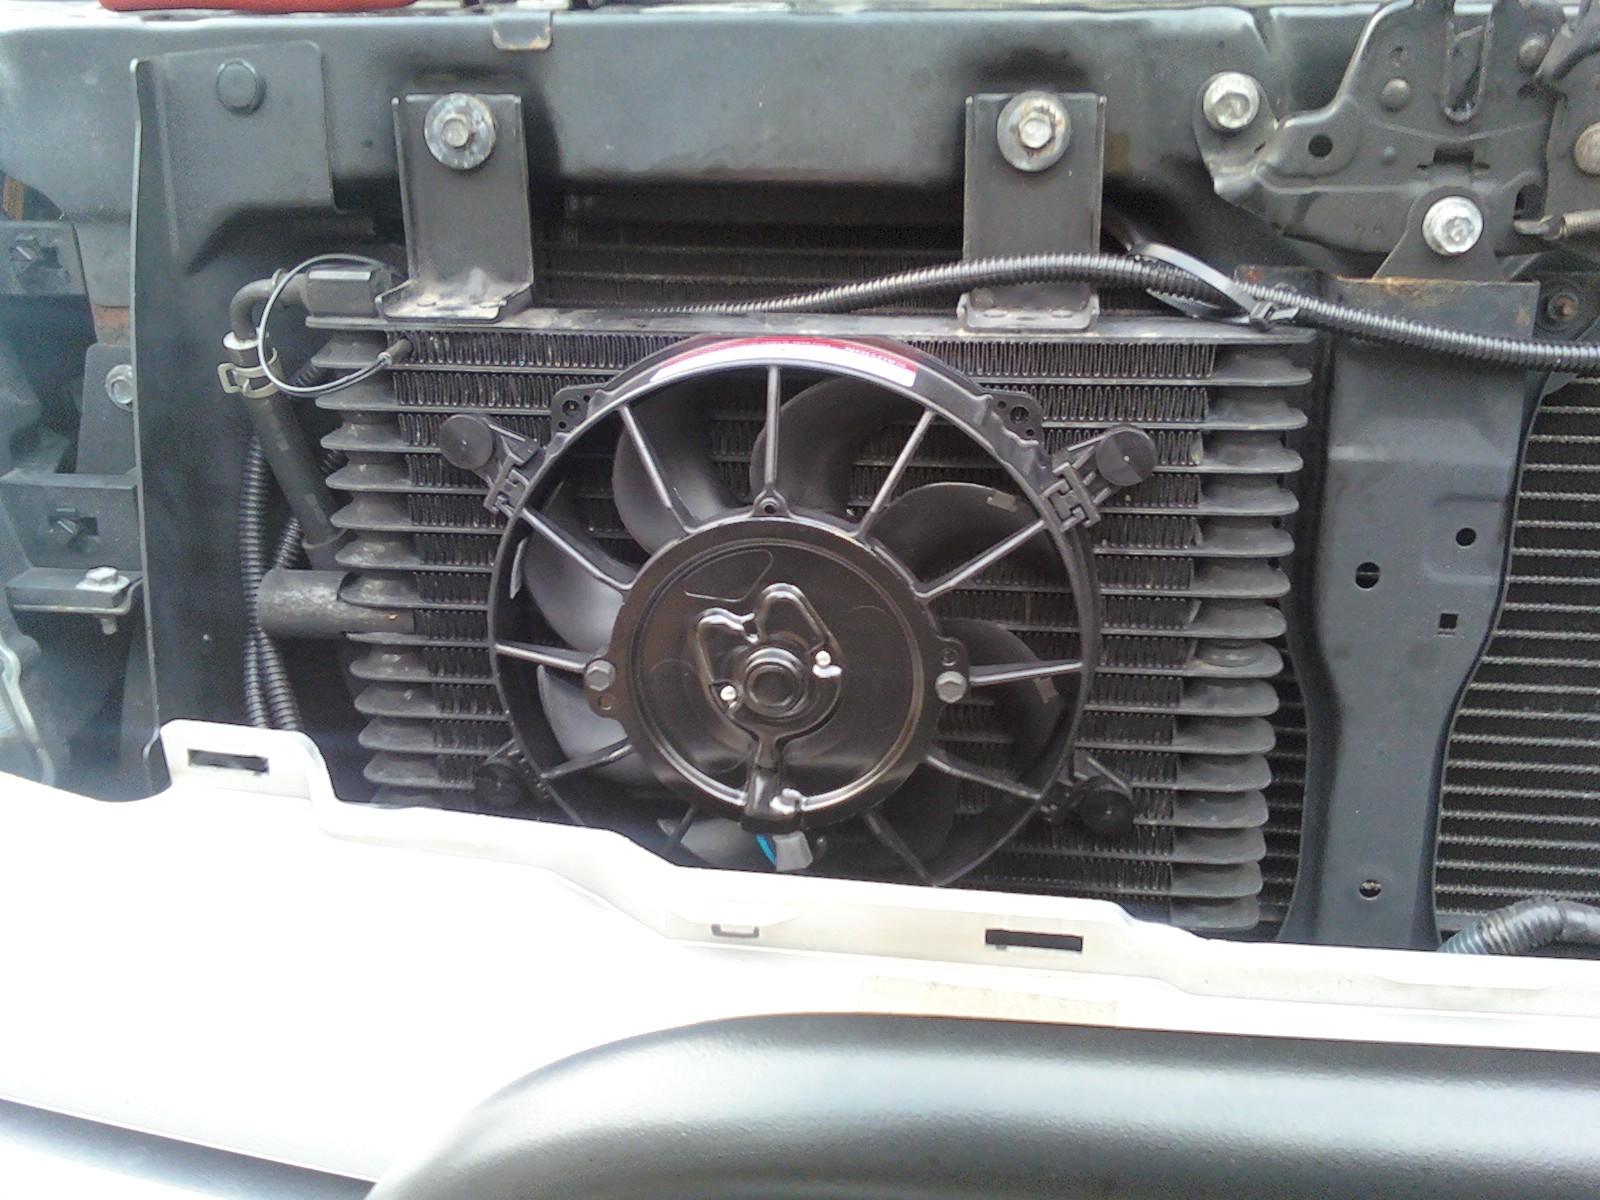 Nissan pathfinder transmission cooler bypass